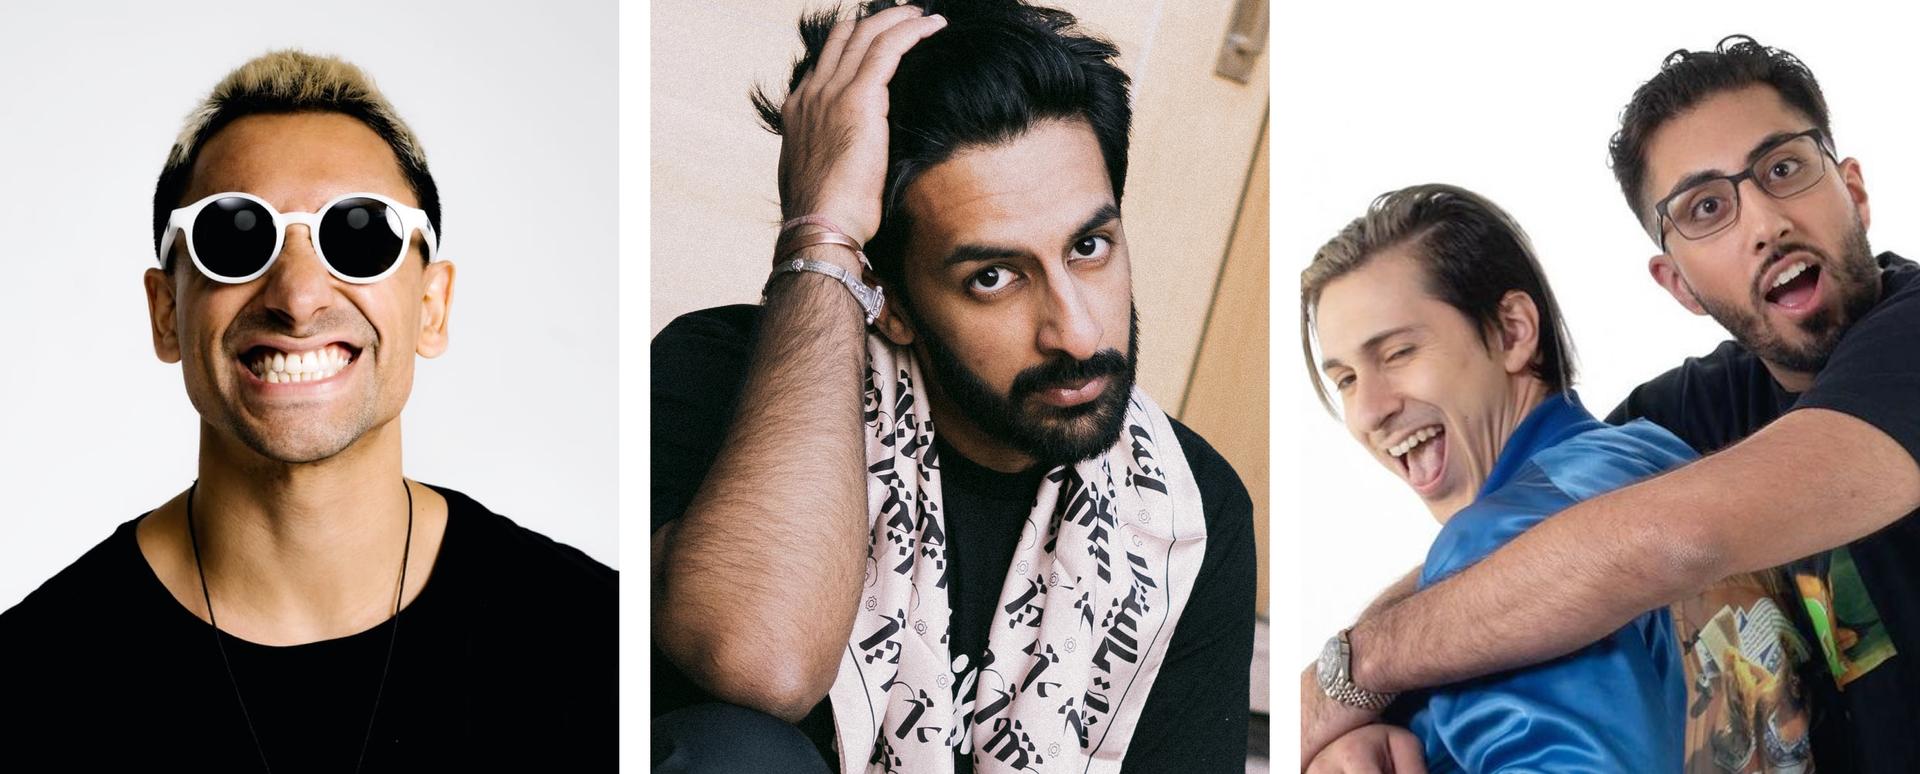 FULL CIRCLE NYC: ShiShi, Indian Cinema, The AVC - FULL CIRCLE NYC: ShiShi, Indian Cinema, The AVC